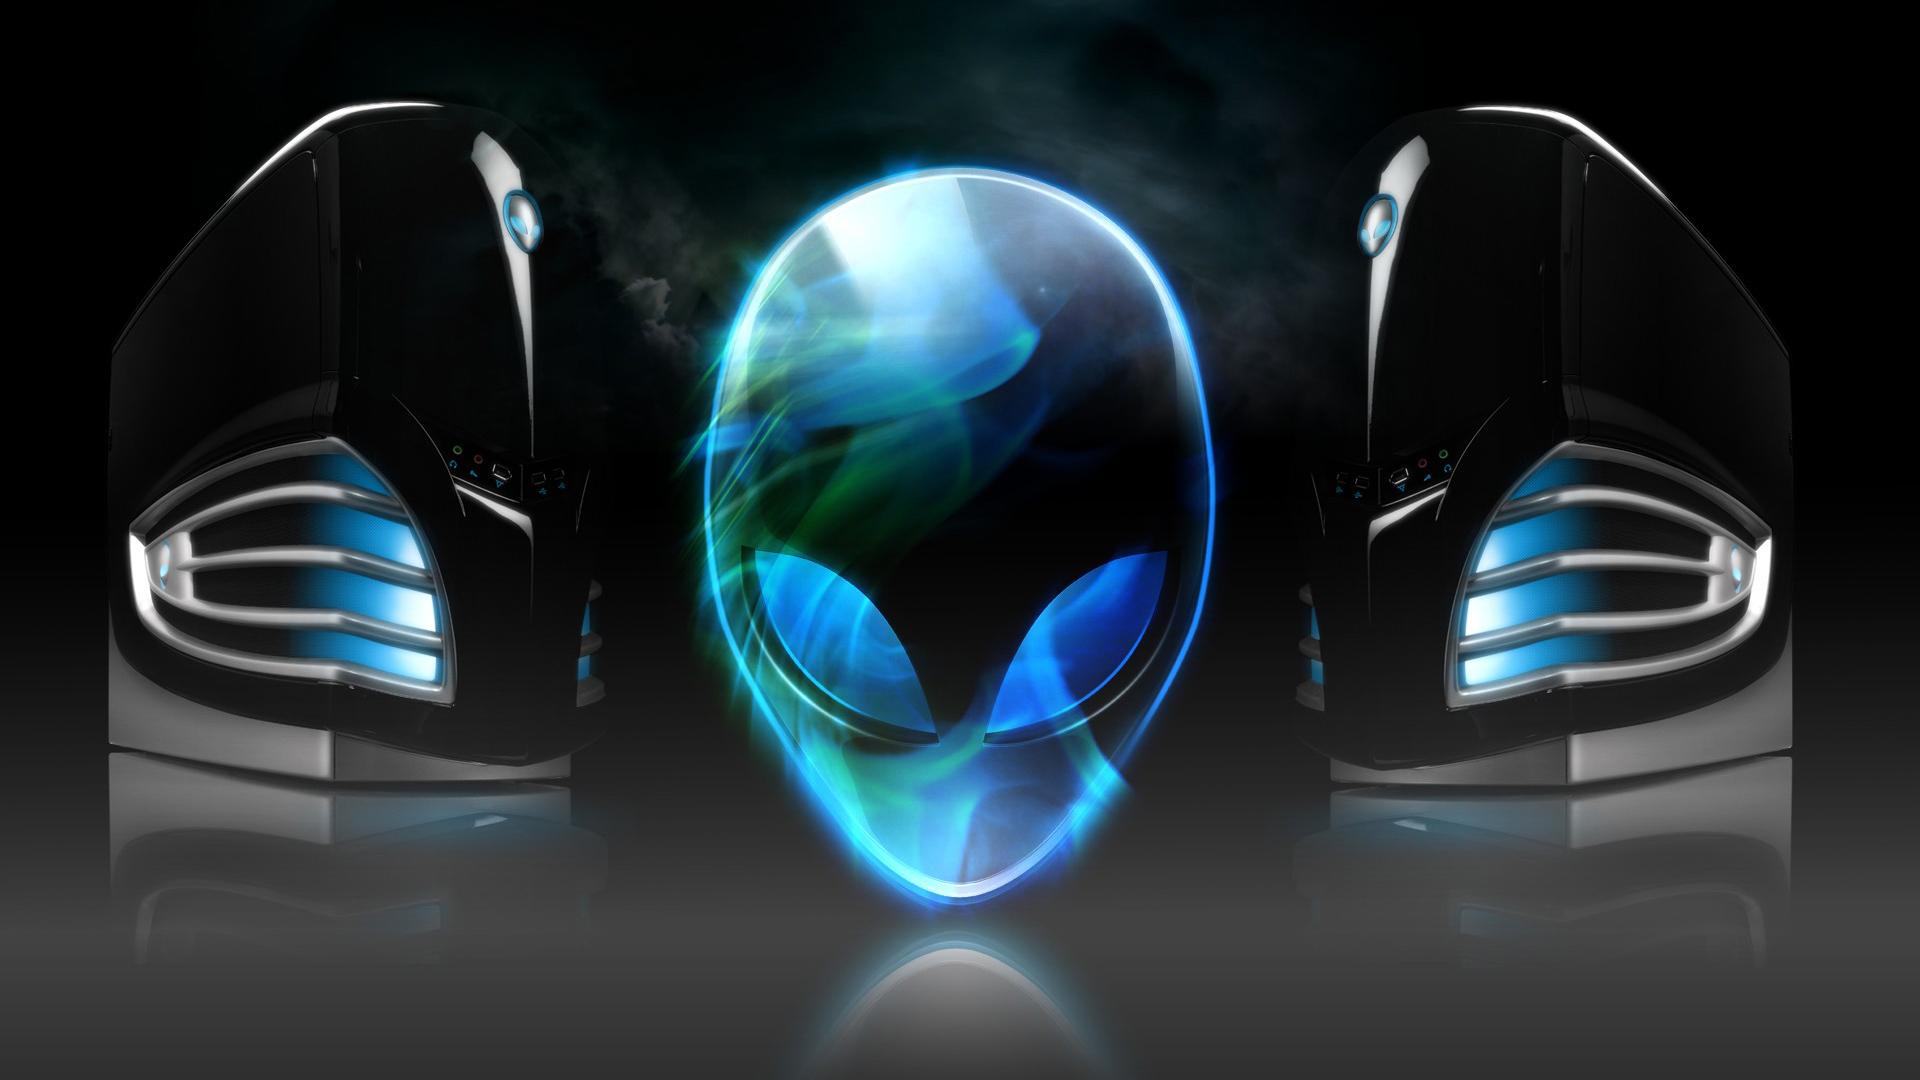 alienware dark blue logo background hd 1920x1080 1080p wallpaper 1920x1080